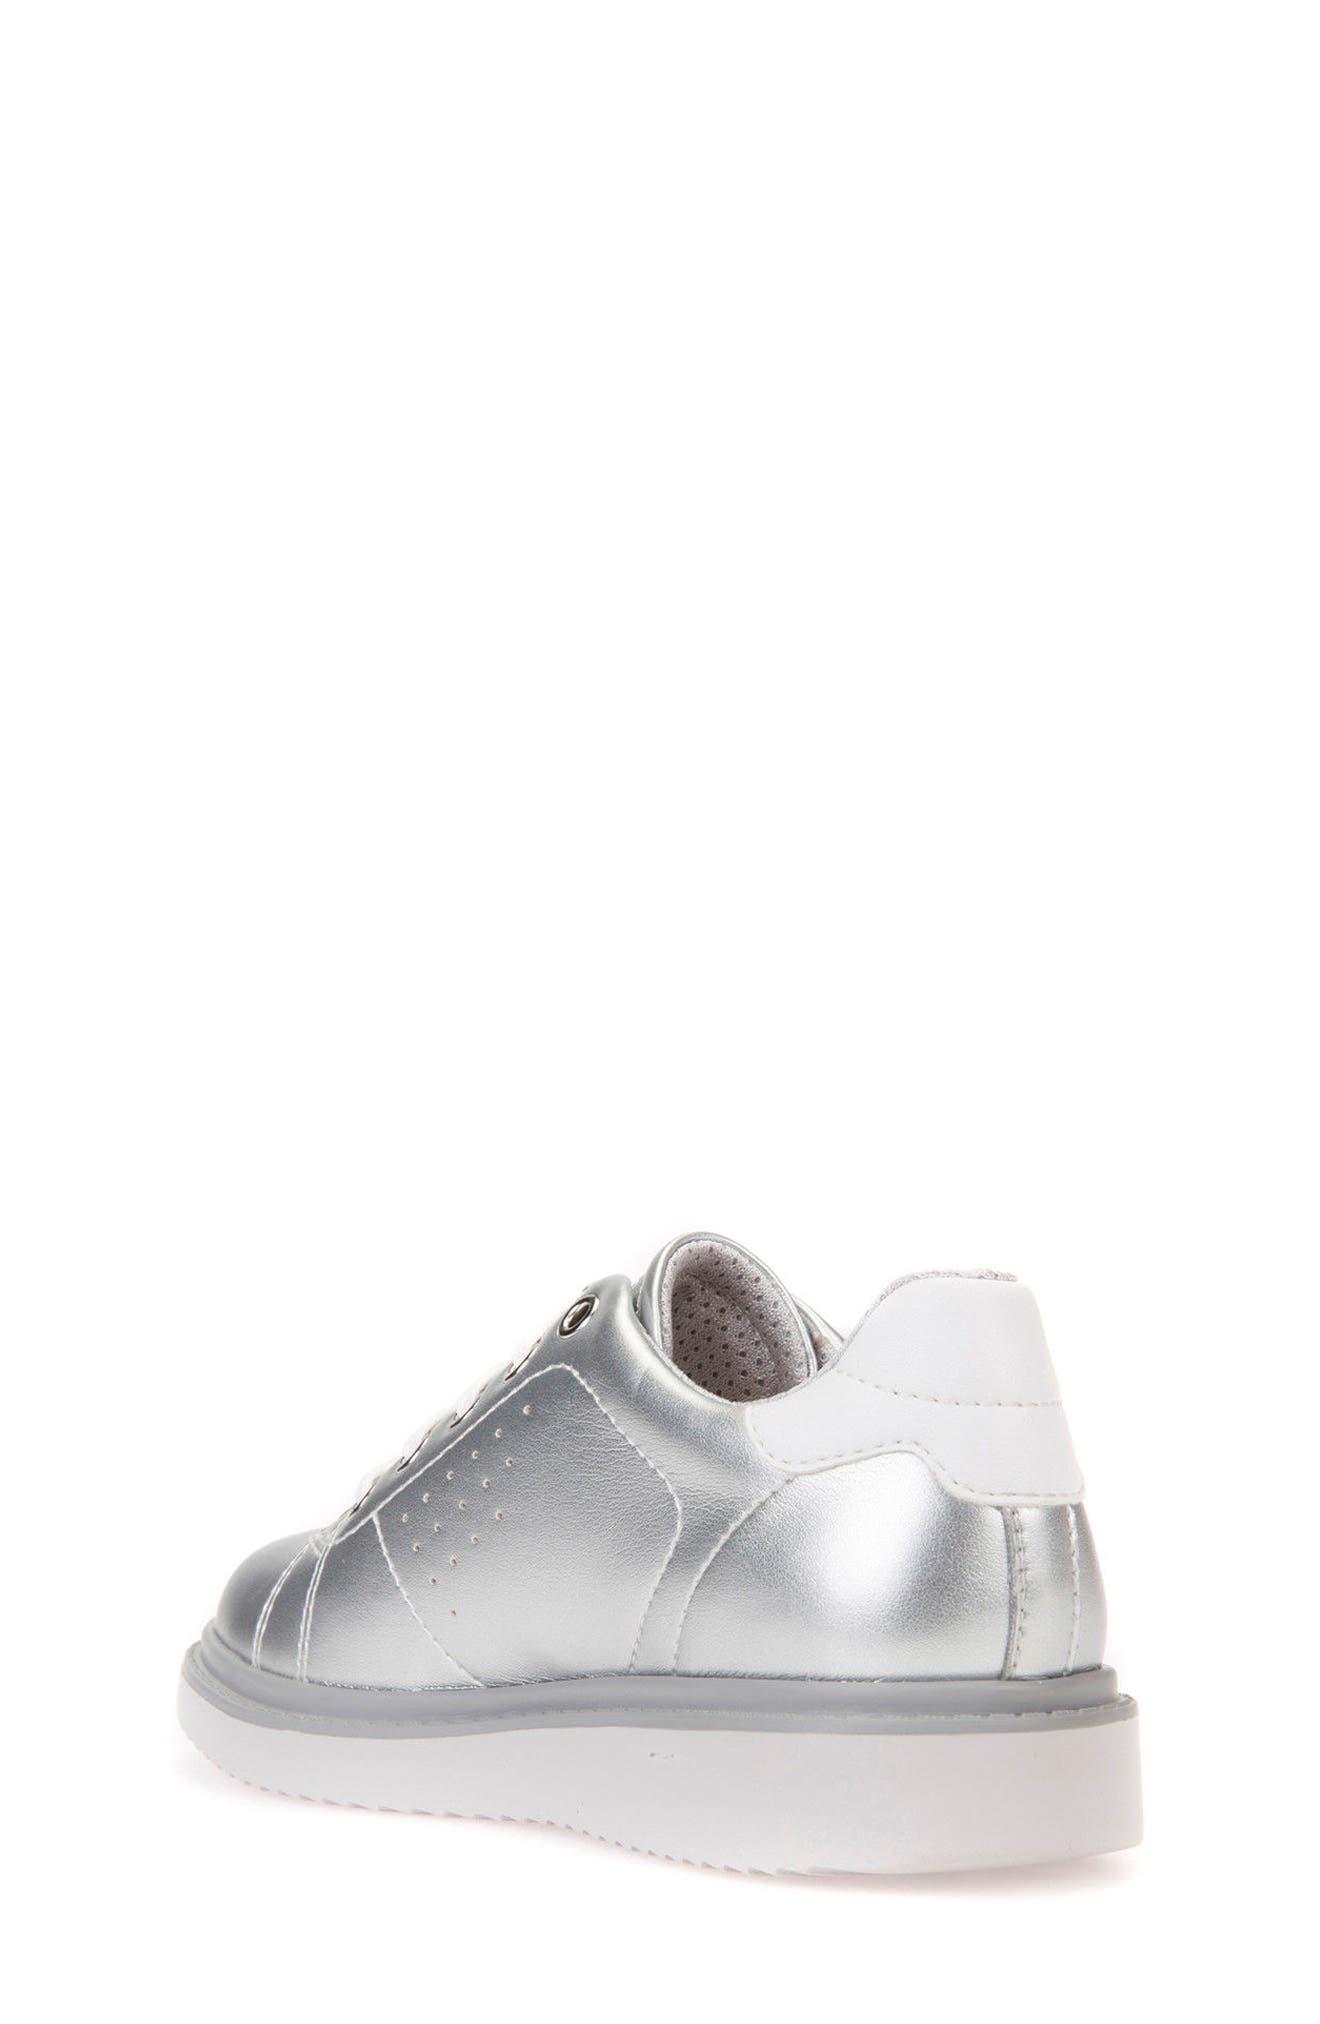 Thymar Low Top Sneaker,                             Alternate thumbnail 2, color,                             SILVER